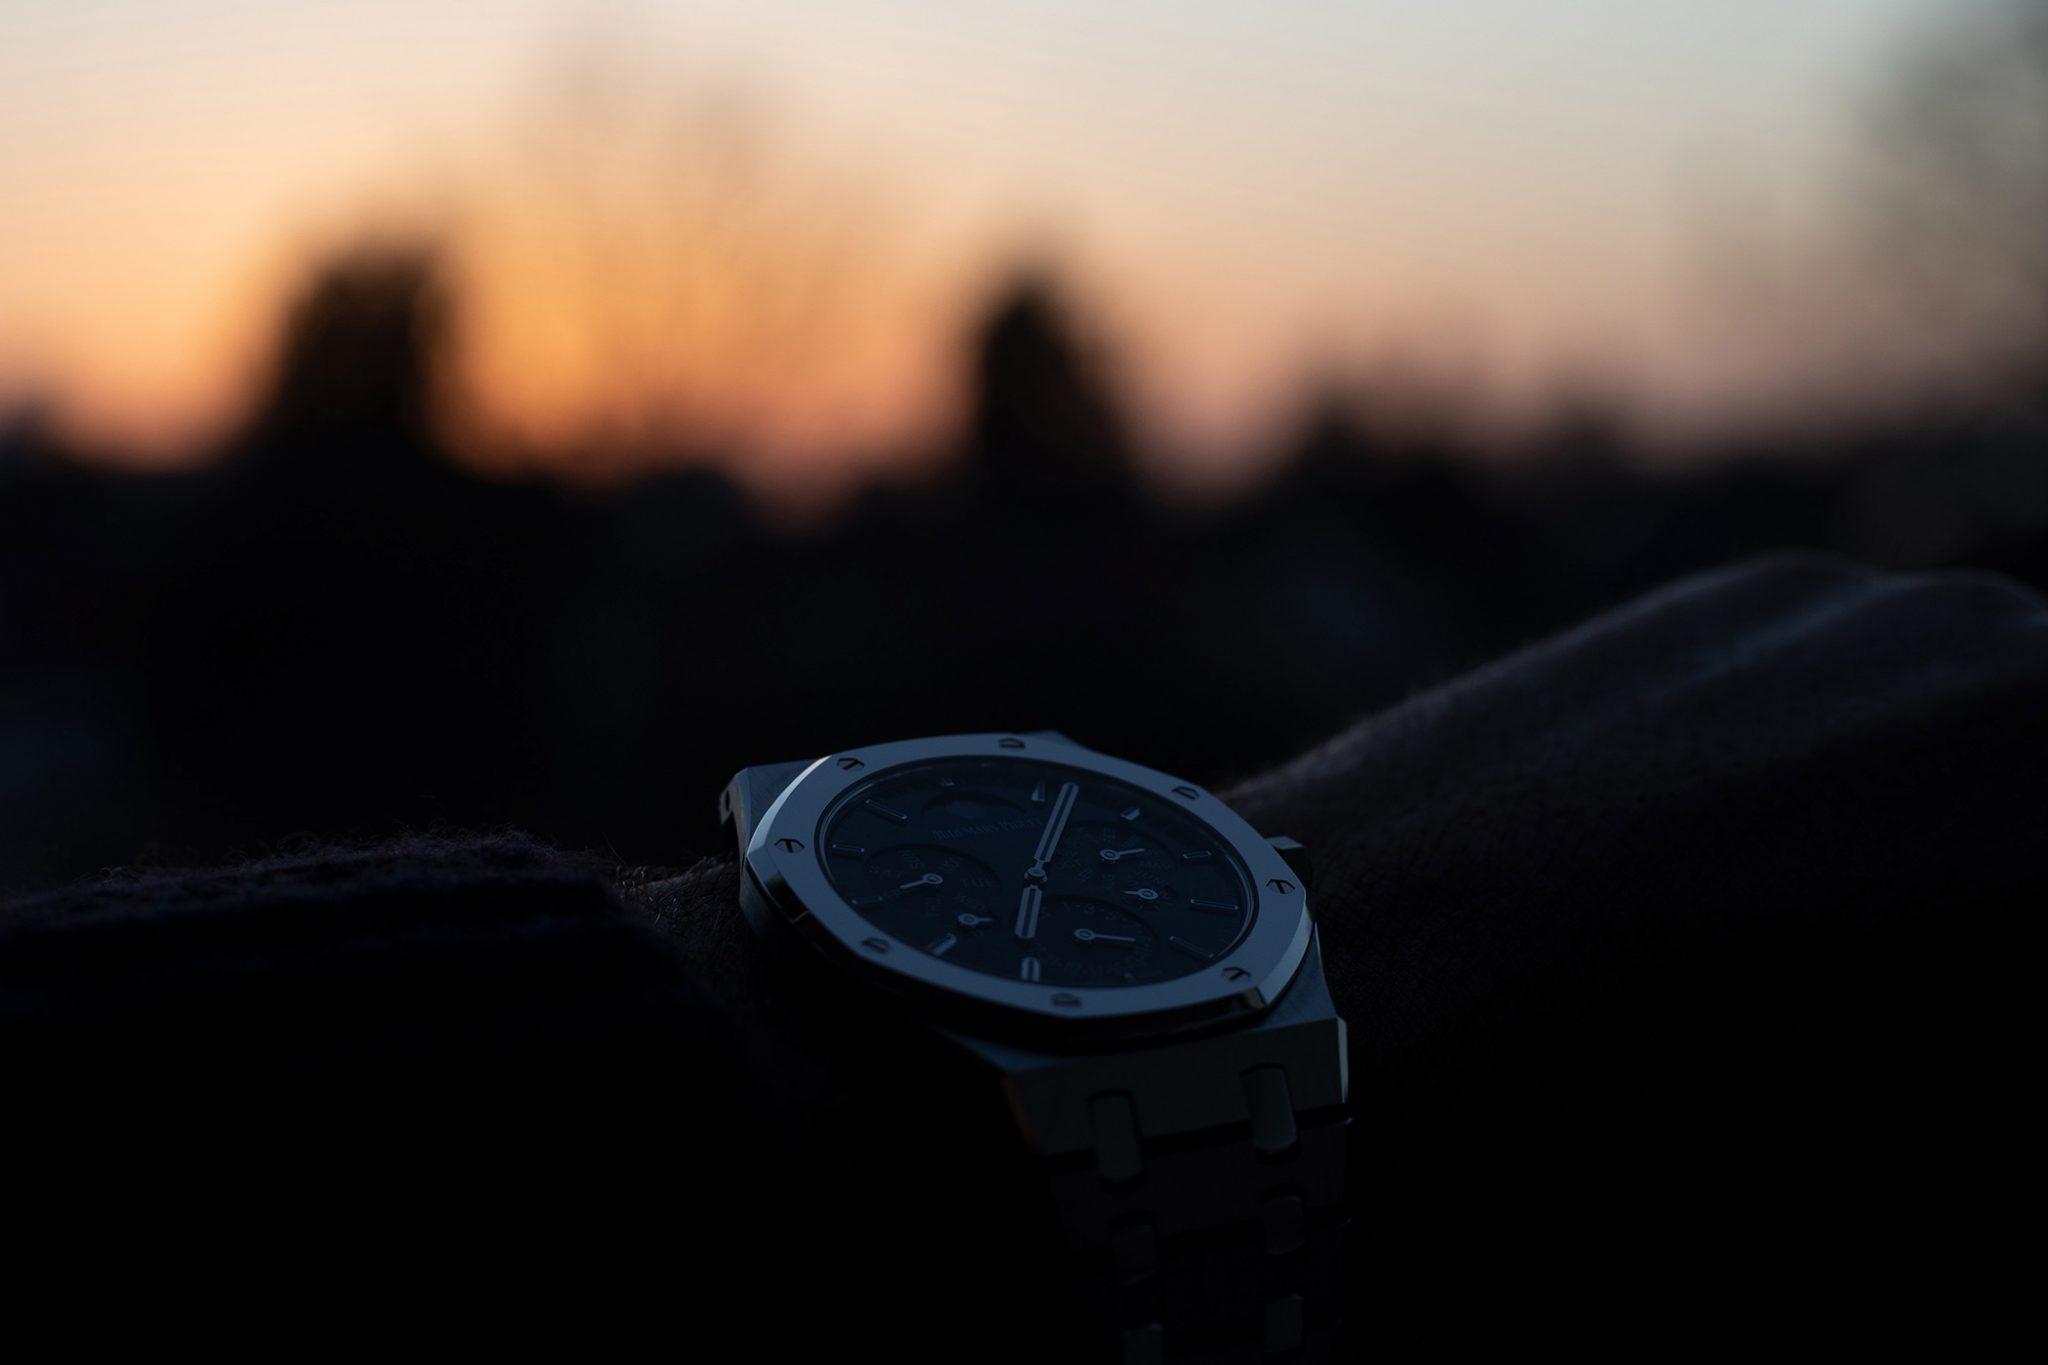 Sunset with the Audemars Piguet Royal Oak Selfwinding Perpetual Calendar Ultra-Thin 26586IP.OO.1240IP.01